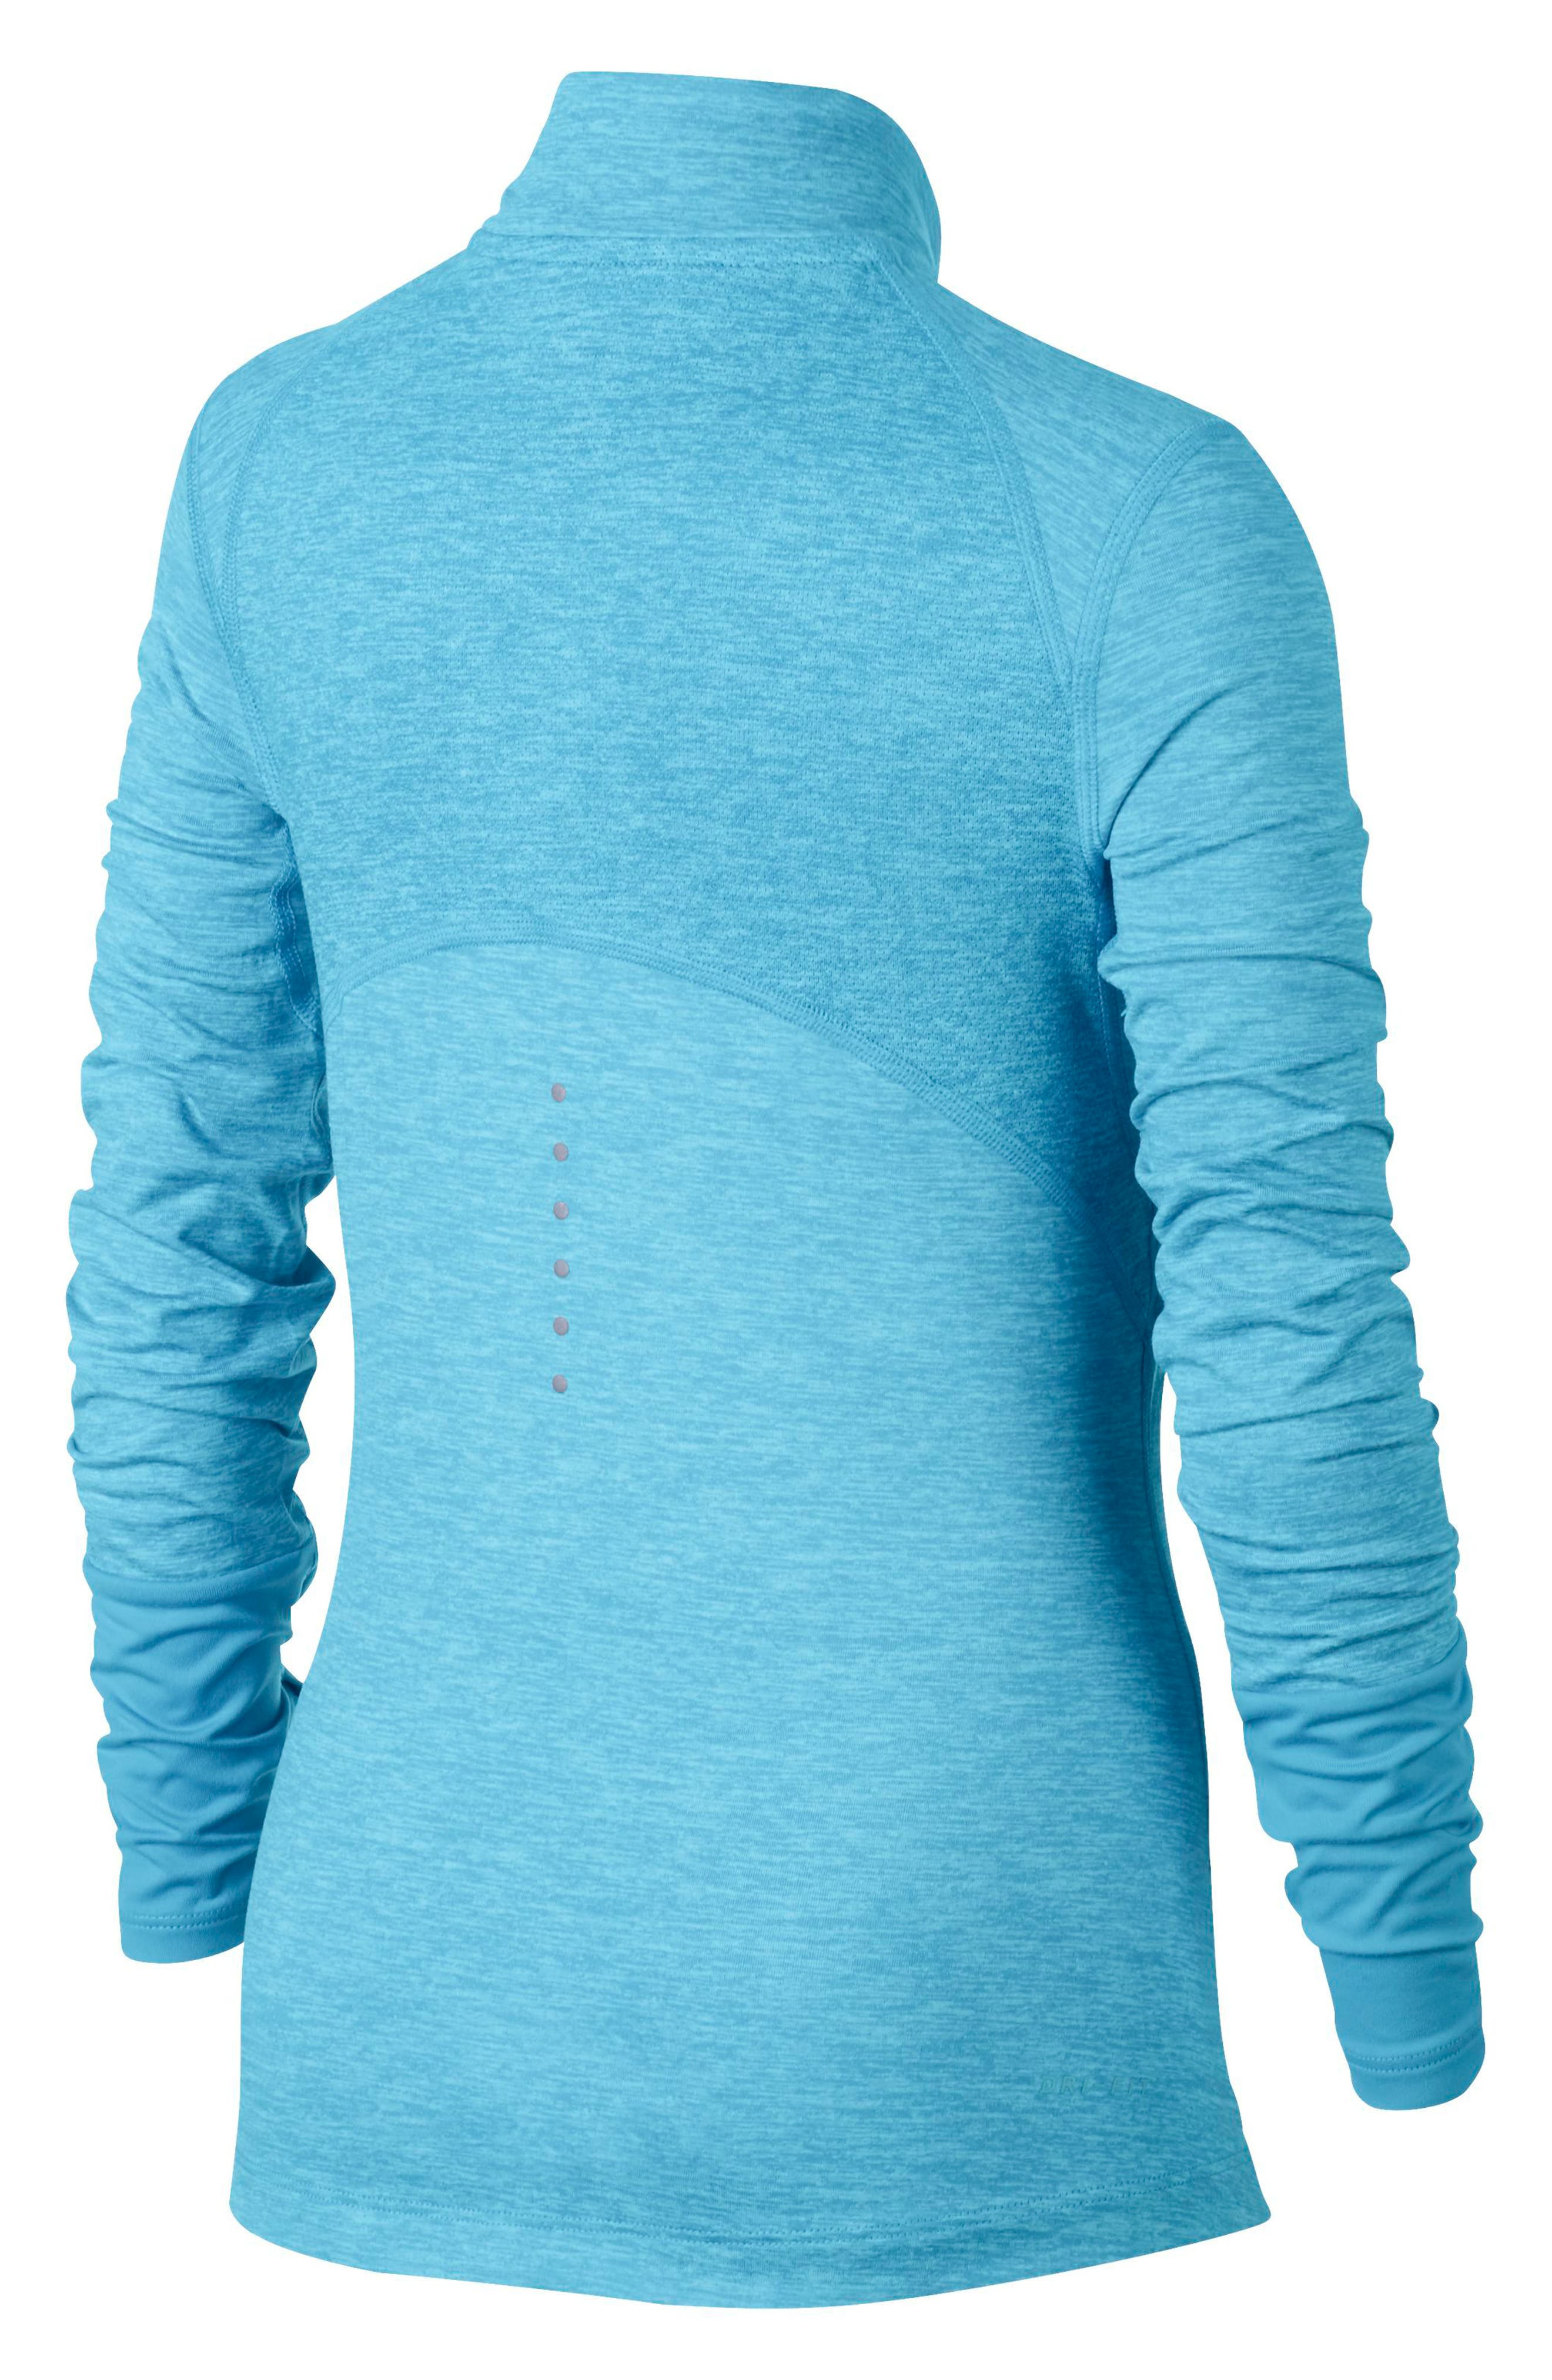 Alternate Image 2  - Nike Dry Element Running Top (Big Girls)